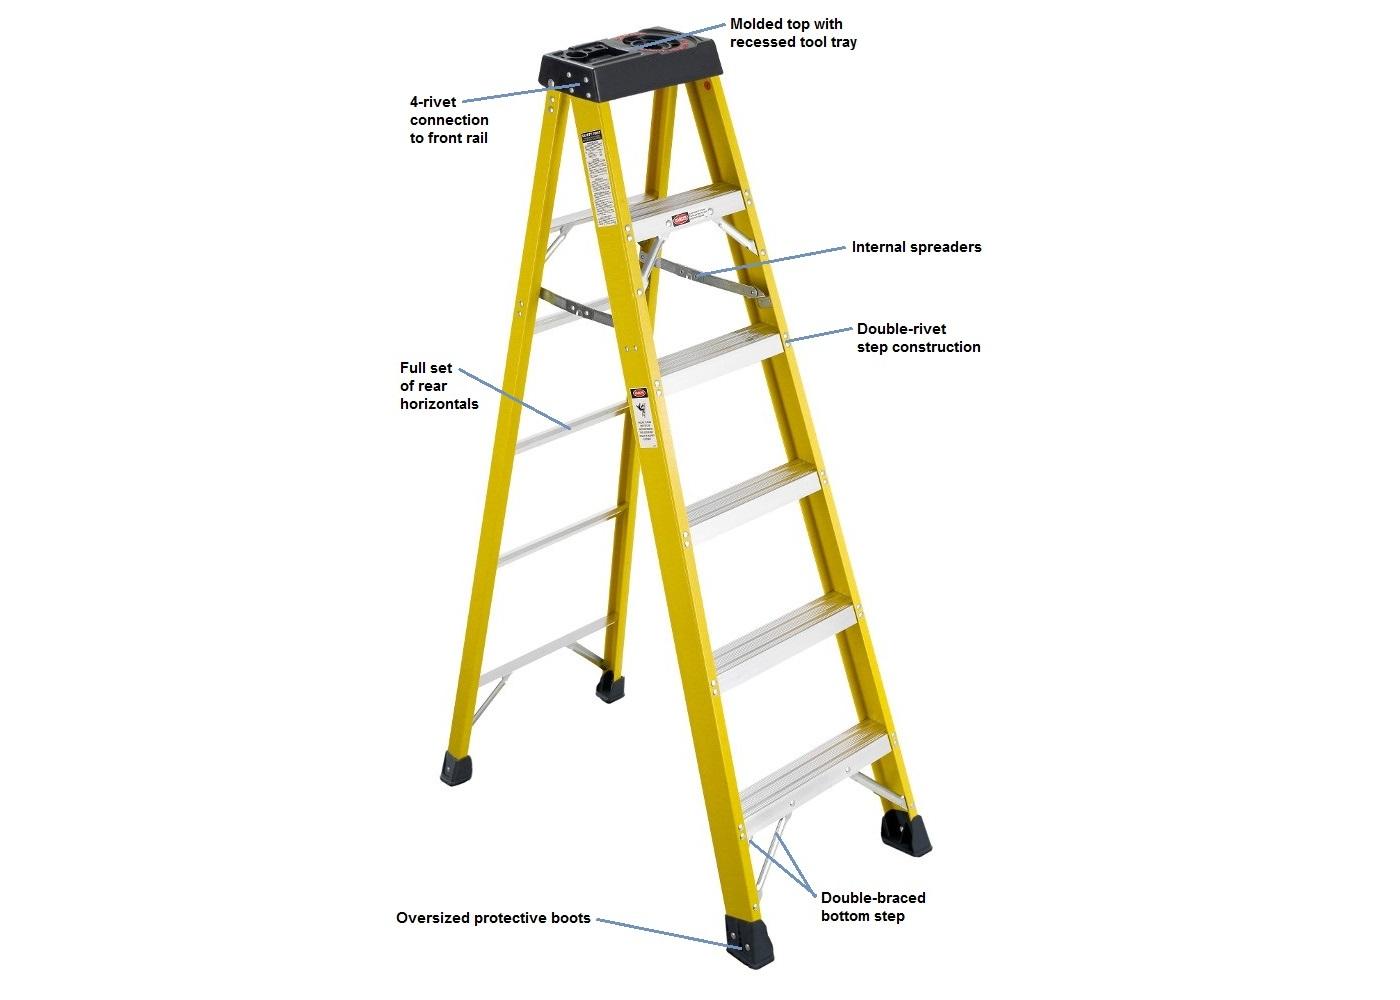 Ladders, Pump Jack Systems, Scaffolding, Planks - Advanced Ladders